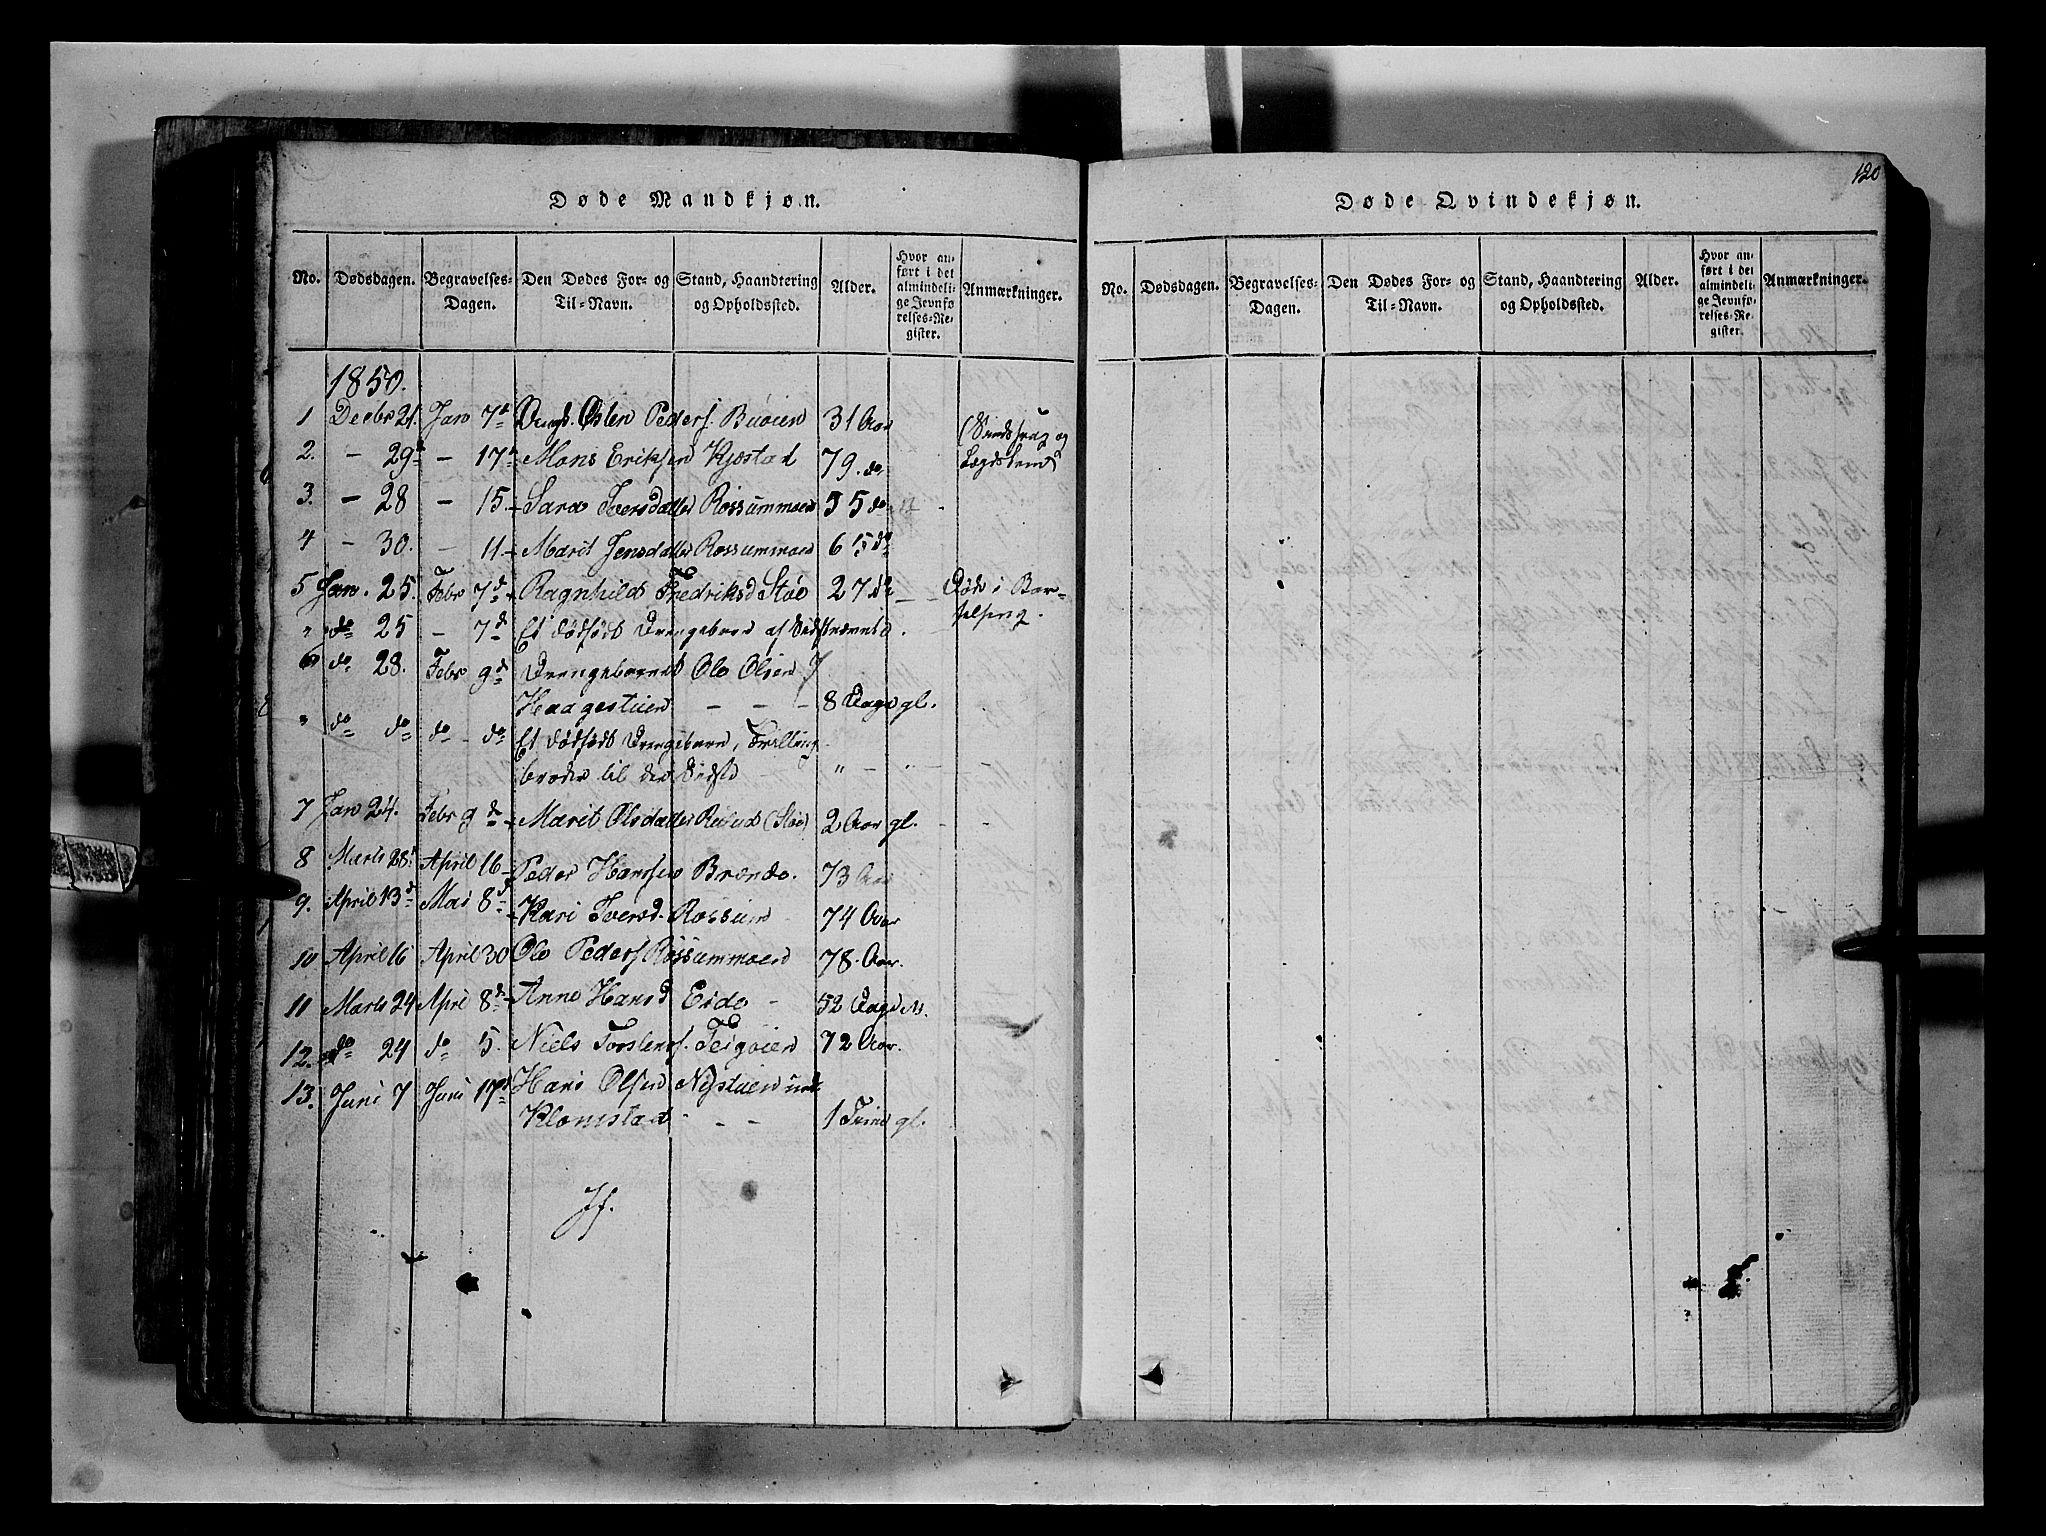 SAH, Fron prestekontor, H/Ha/Hab/L0002: Klokkerbok nr. 2, 1816-1850, s. 120